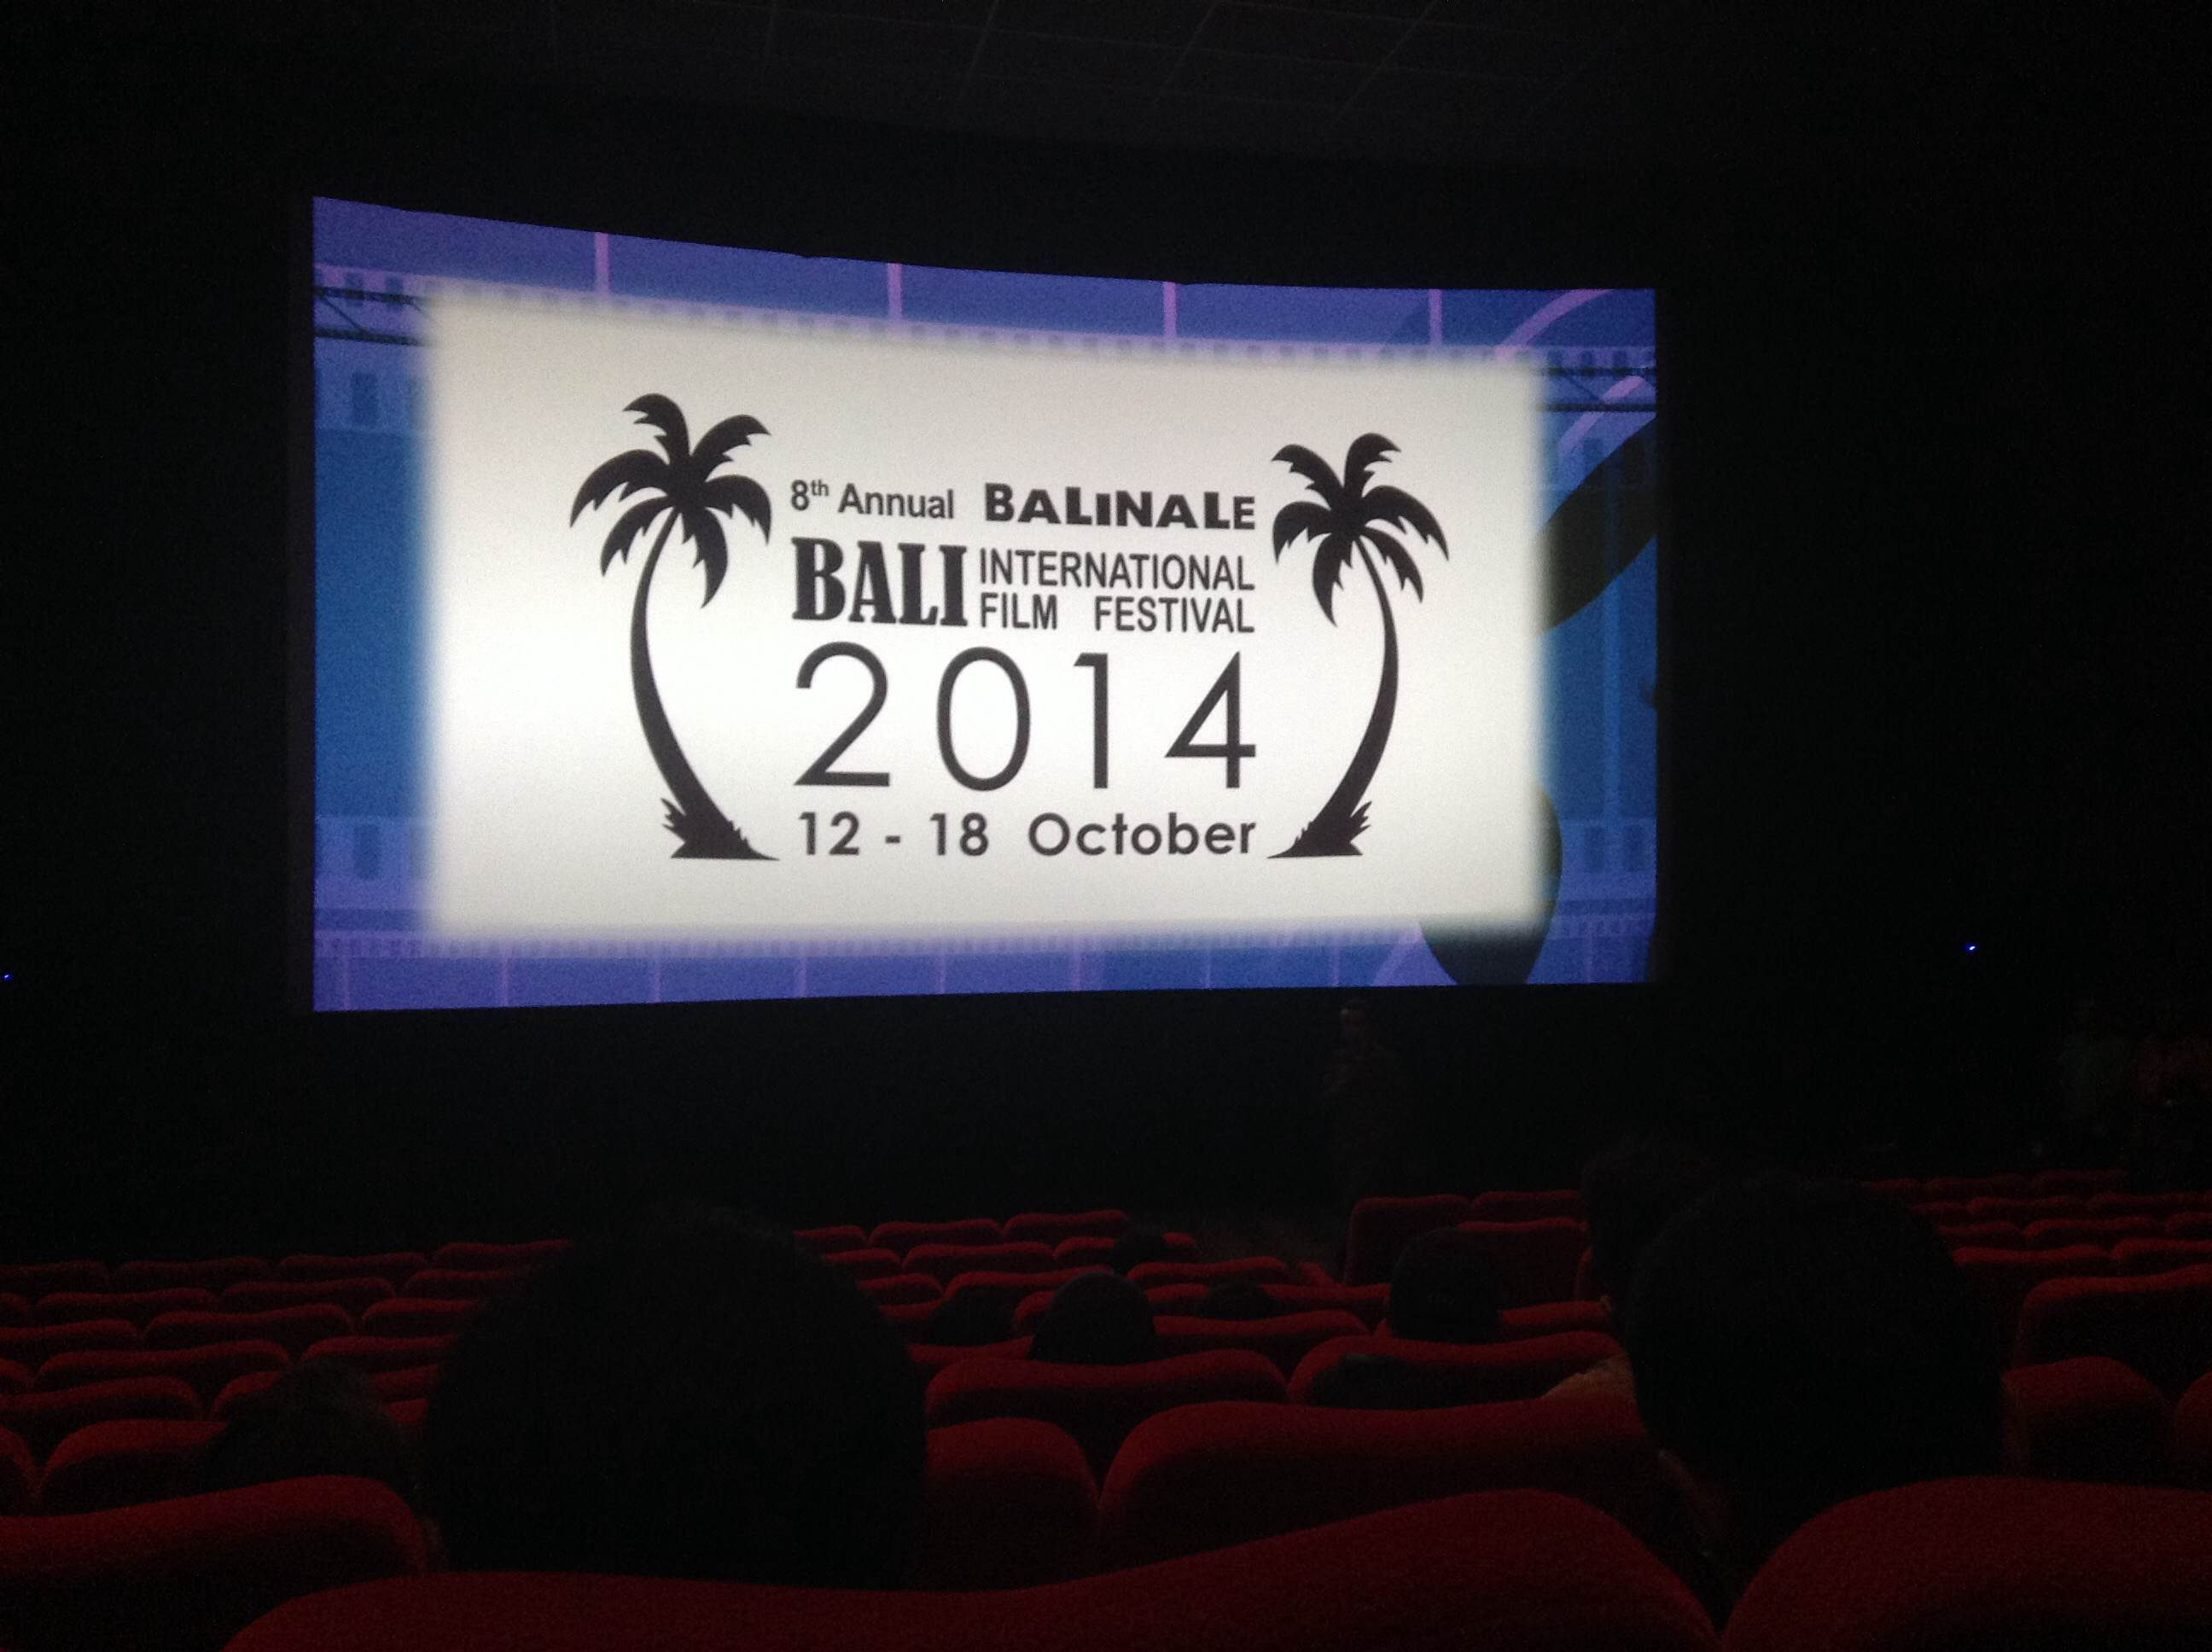 Balinale Film Festival Bali Festivals